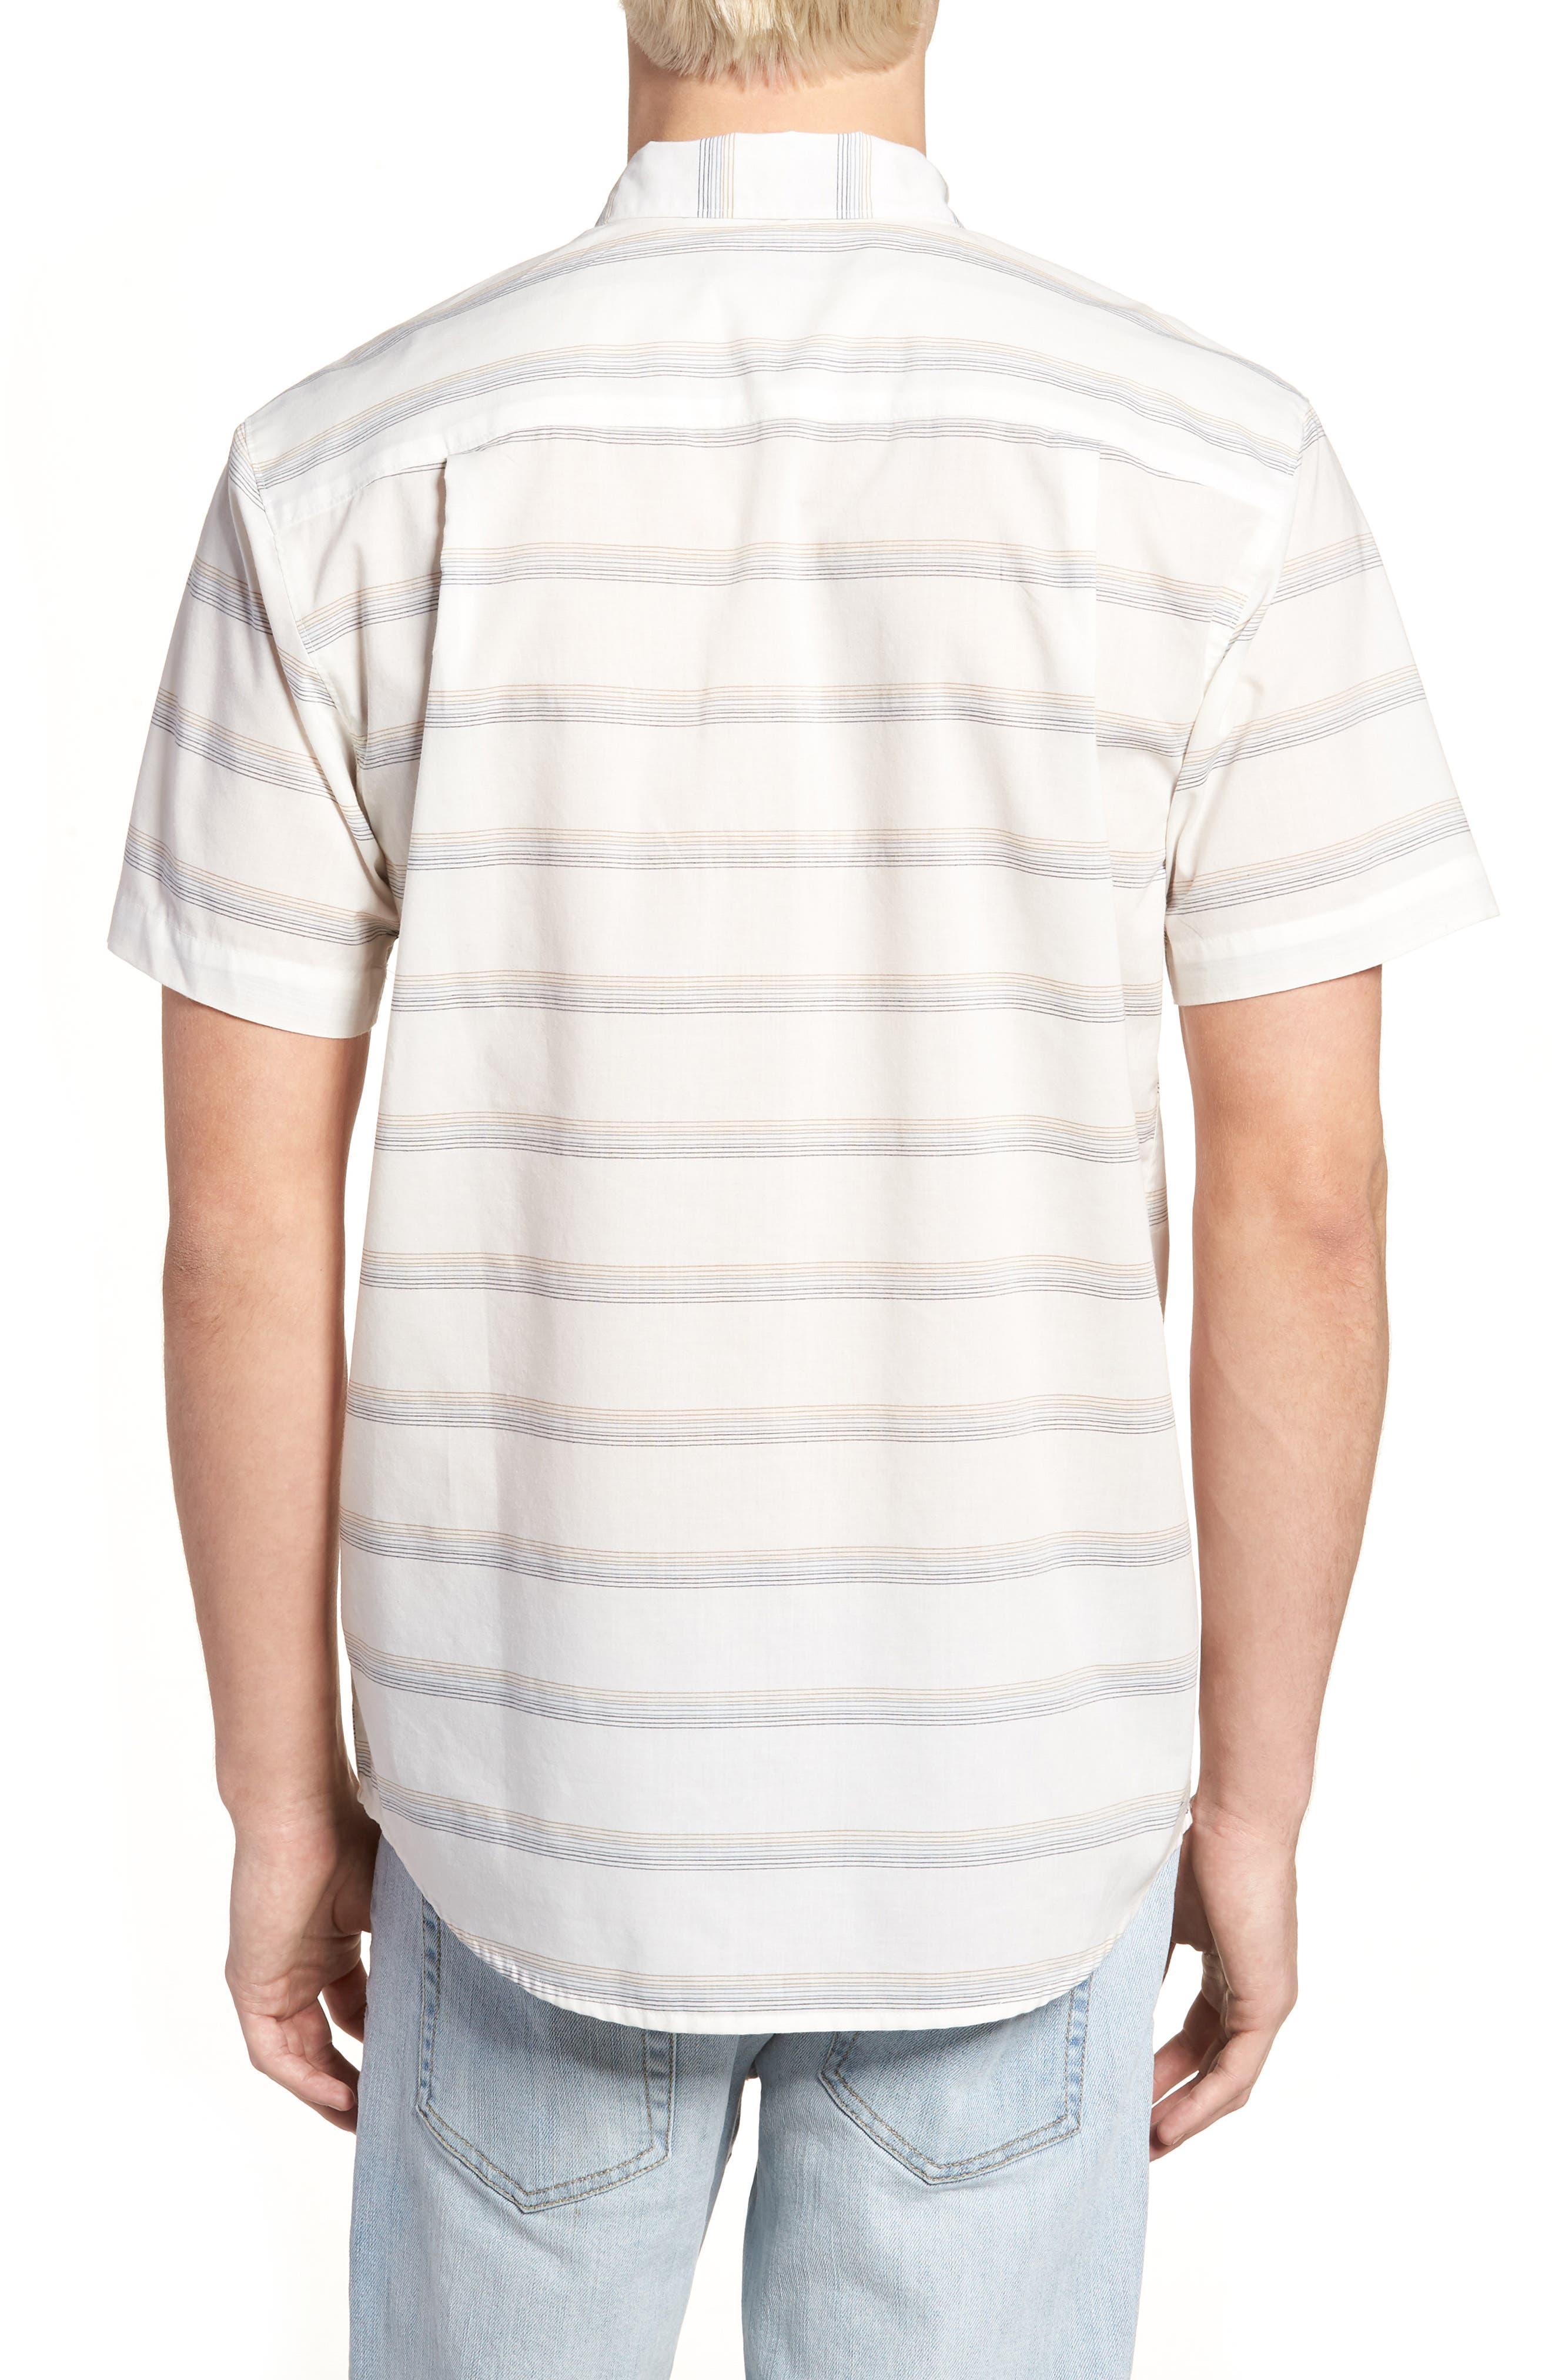 Pickett Woven Shirt,                             Alternate thumbnail 4, color,